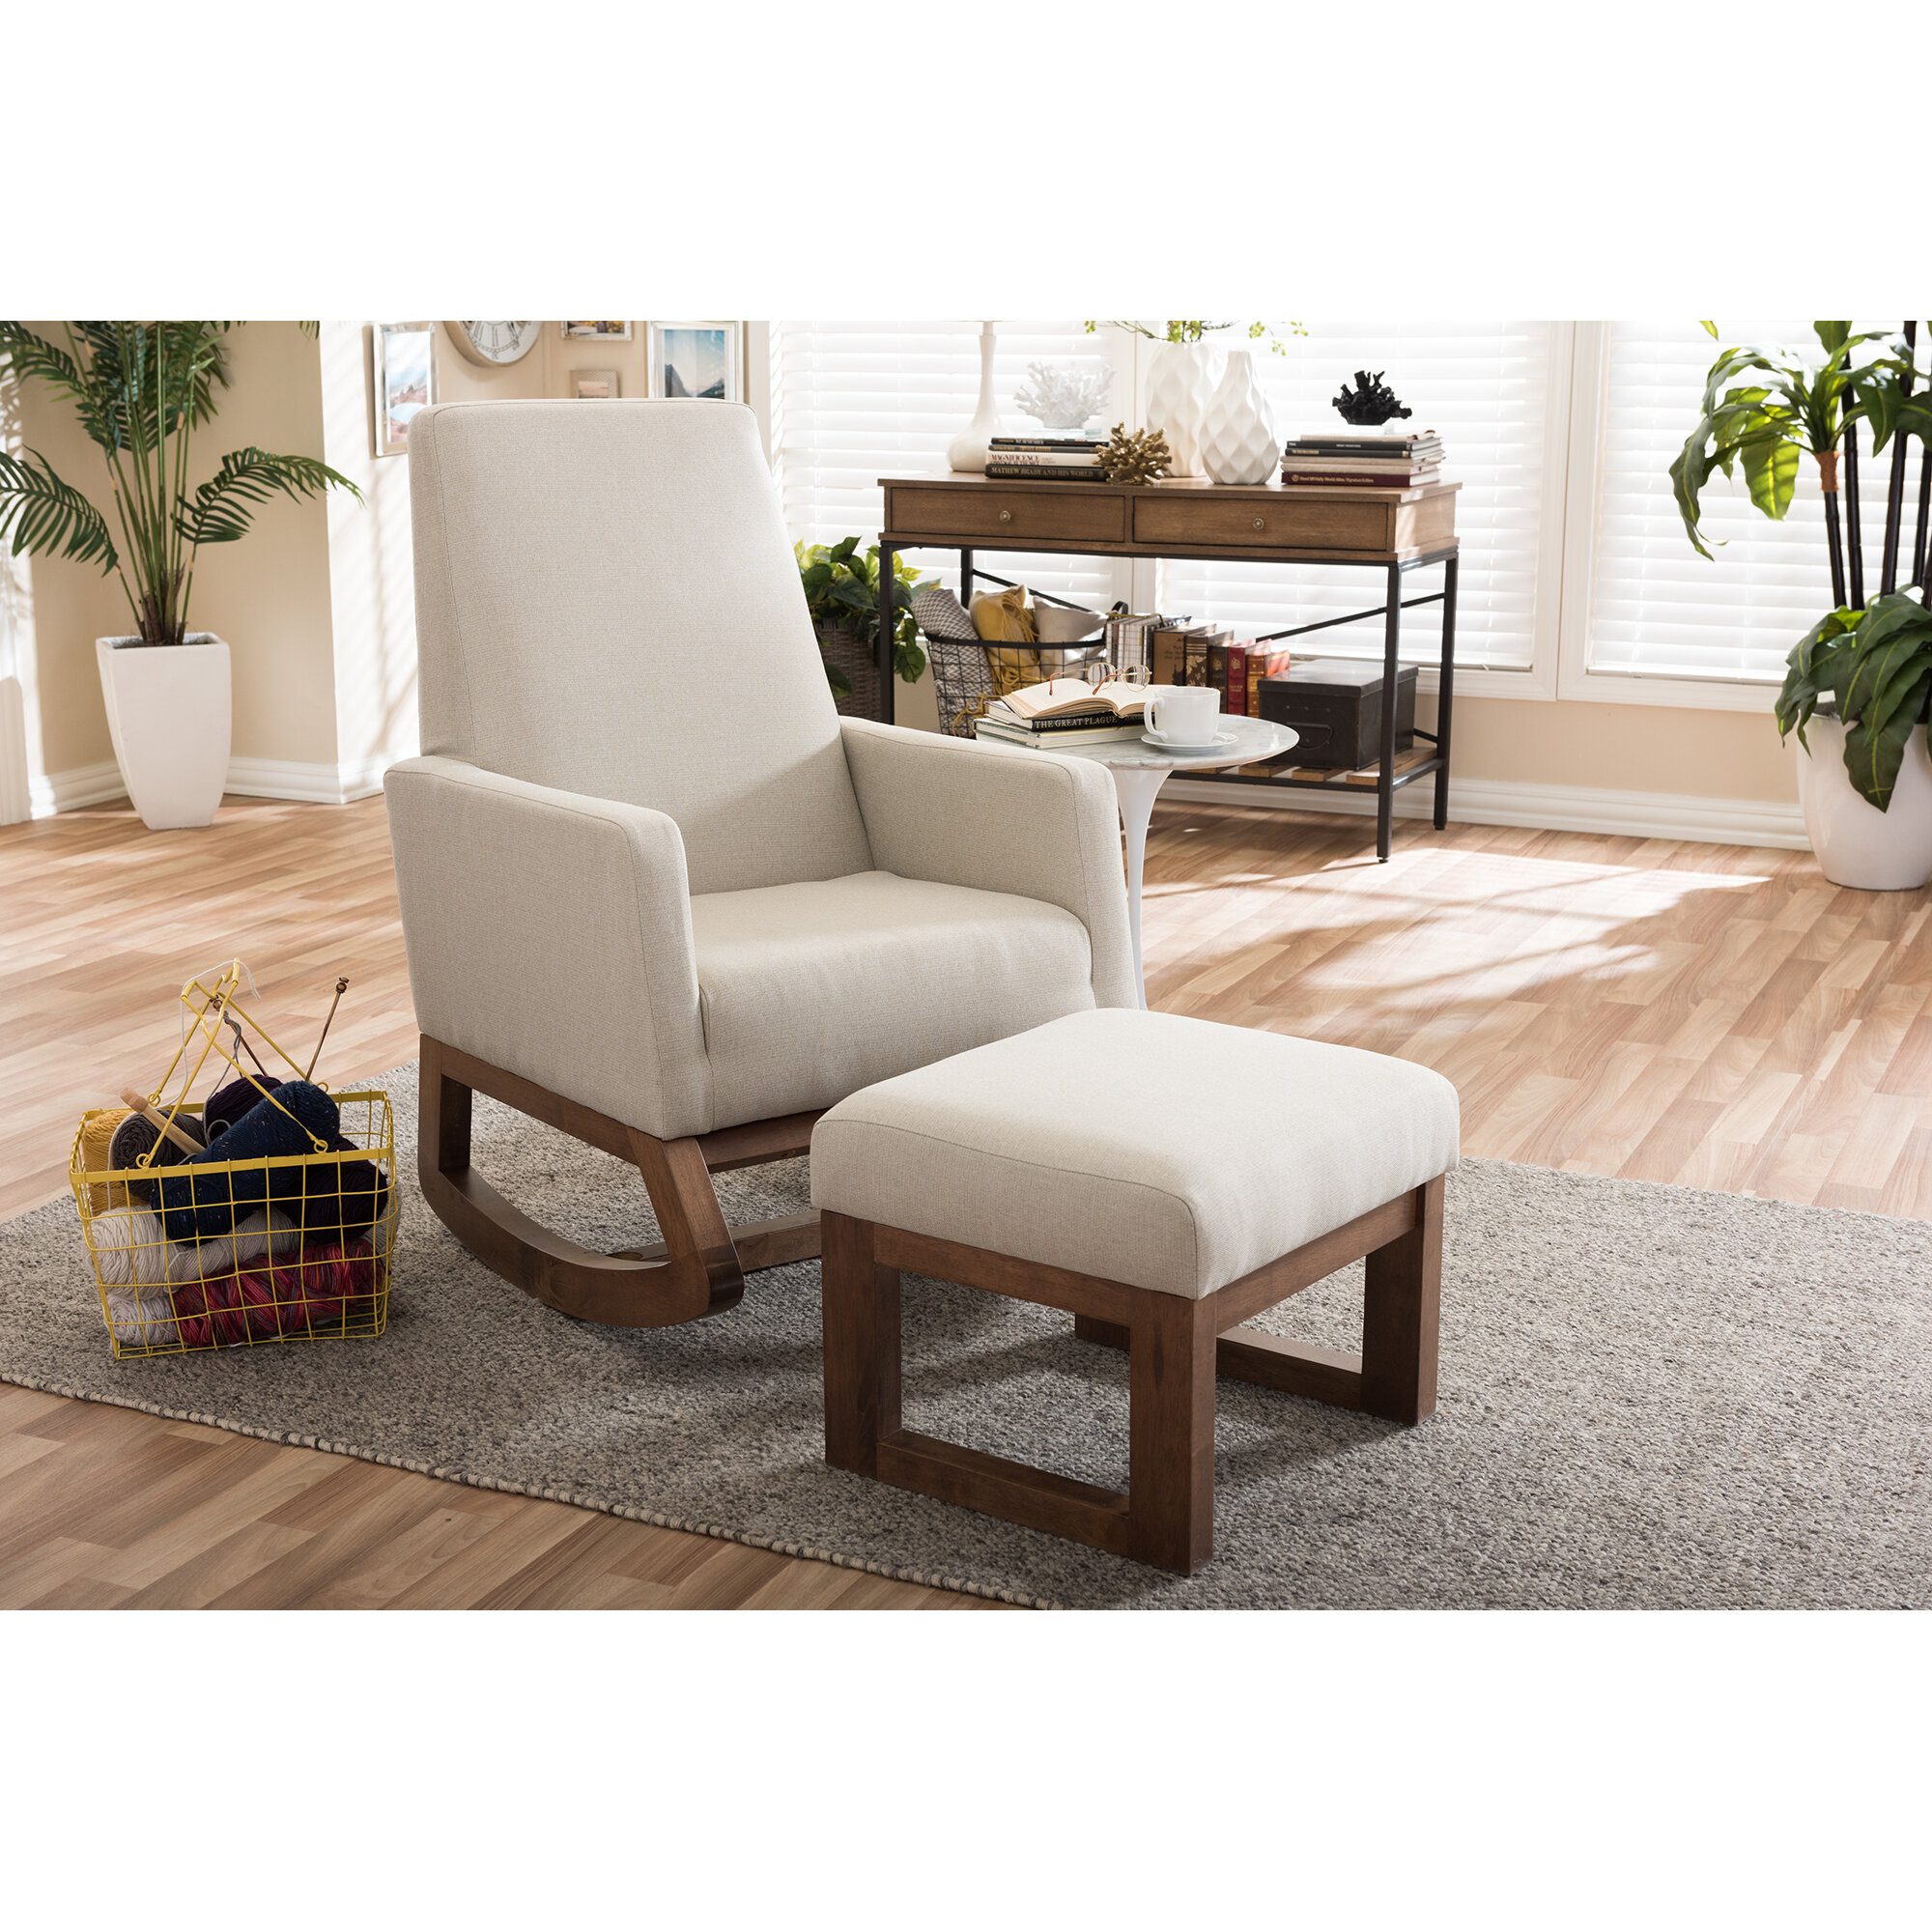 quality design 6b7ca d2fb4 Nola Rocking Chair & Ottoman